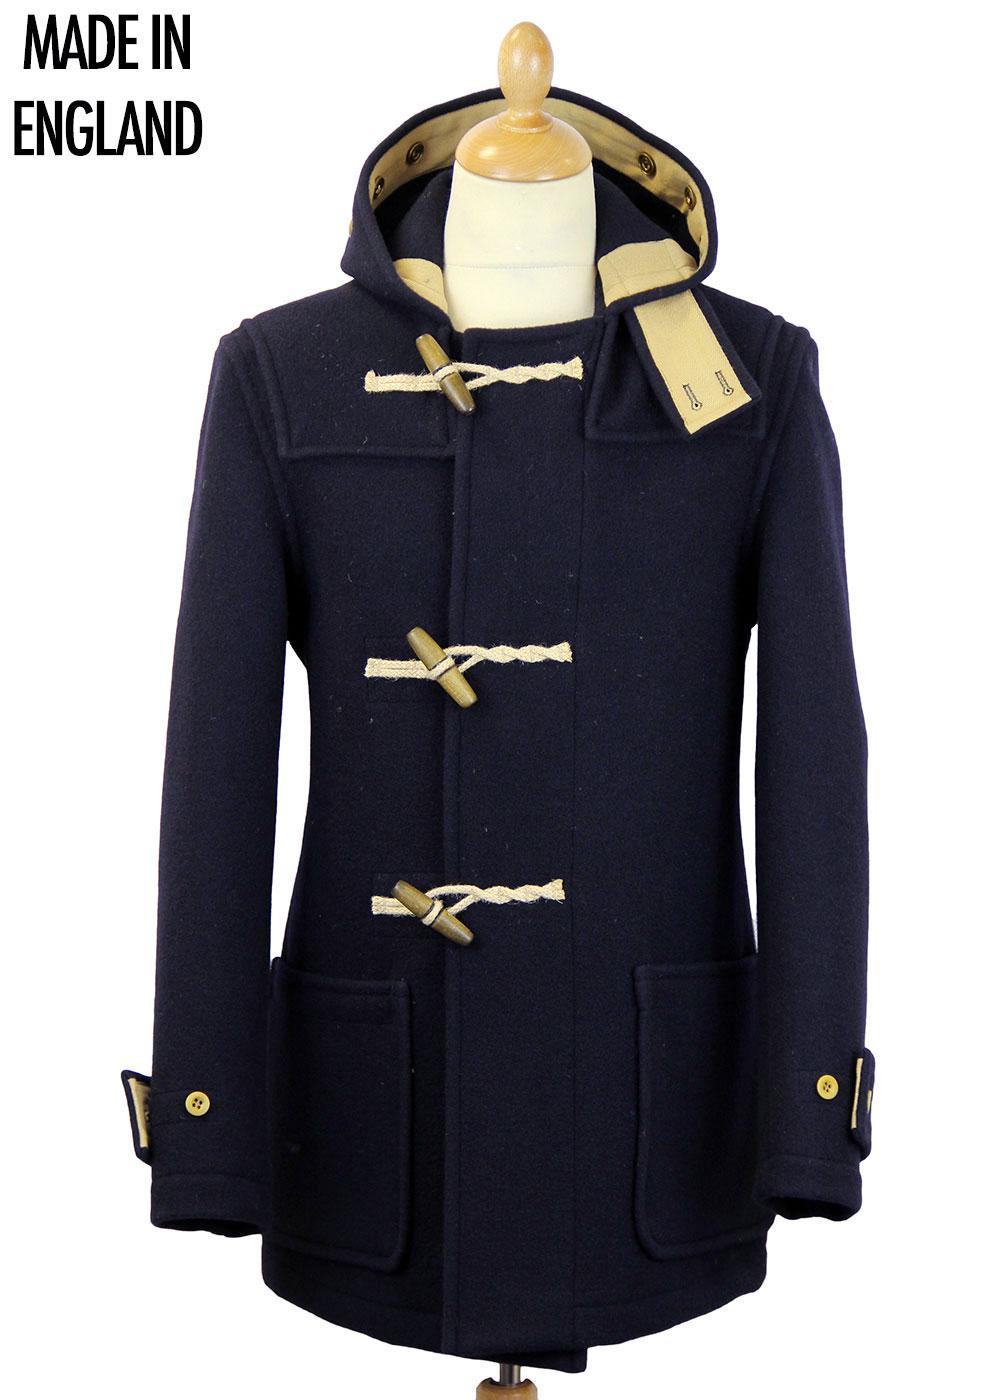 GLOVERALL Retro Mid Length Monty Duffle Coat NAVY